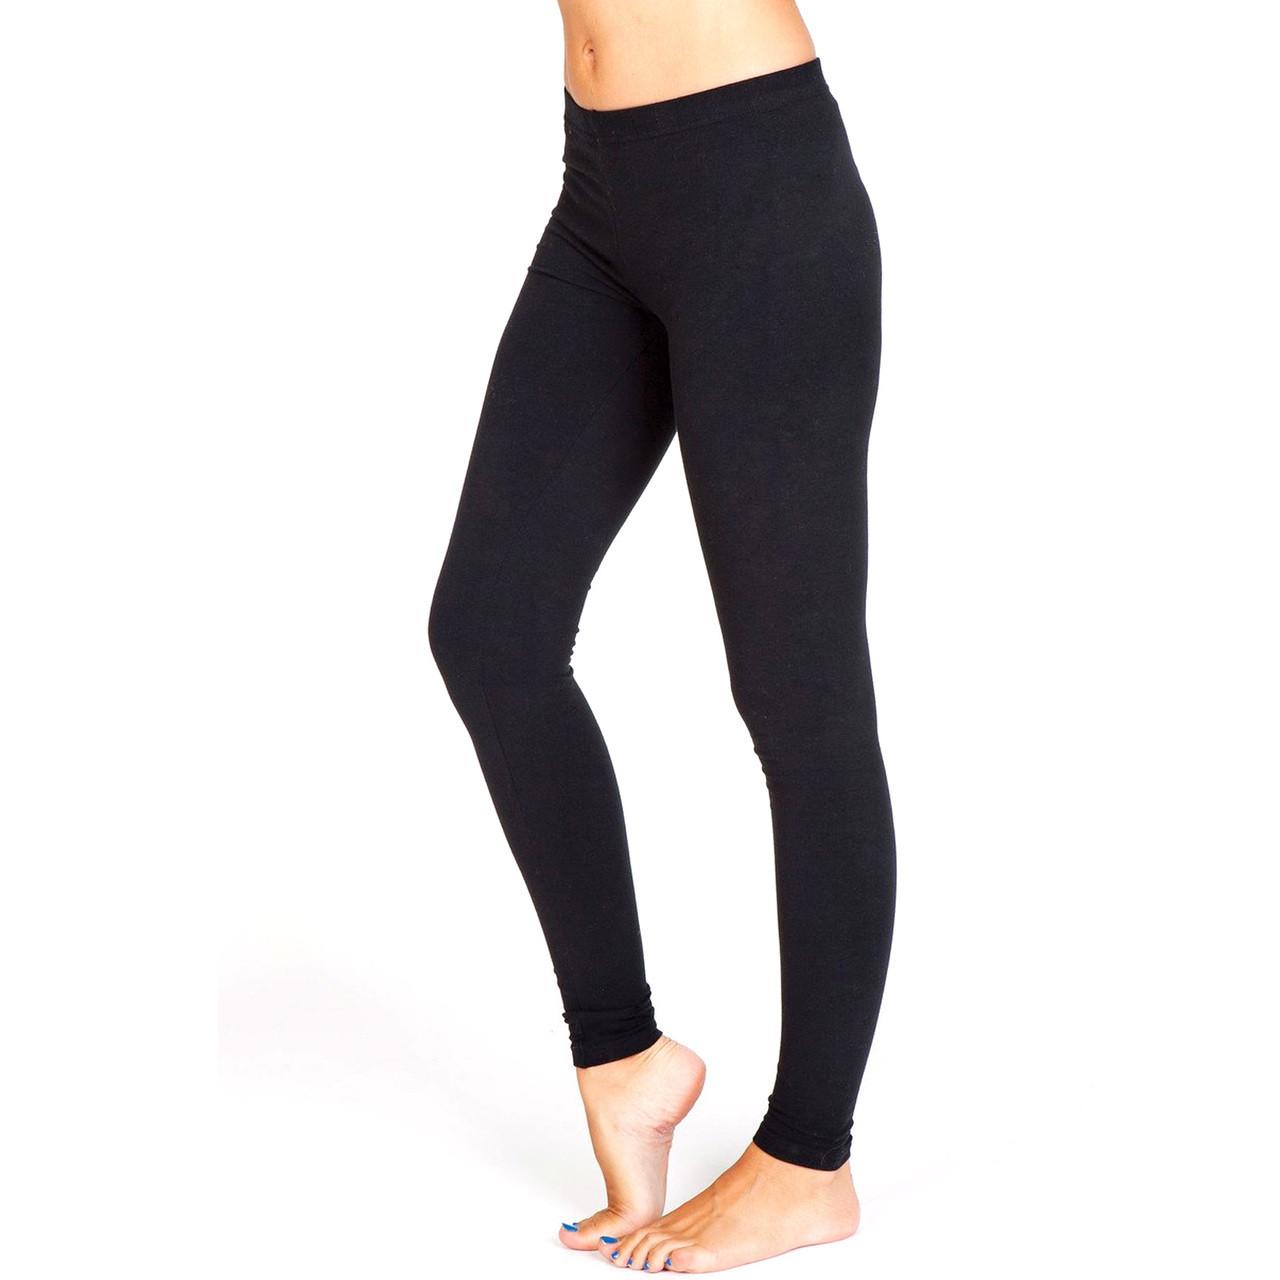 43a9a4a03147f black stretch leggings women   plain fitness clothing